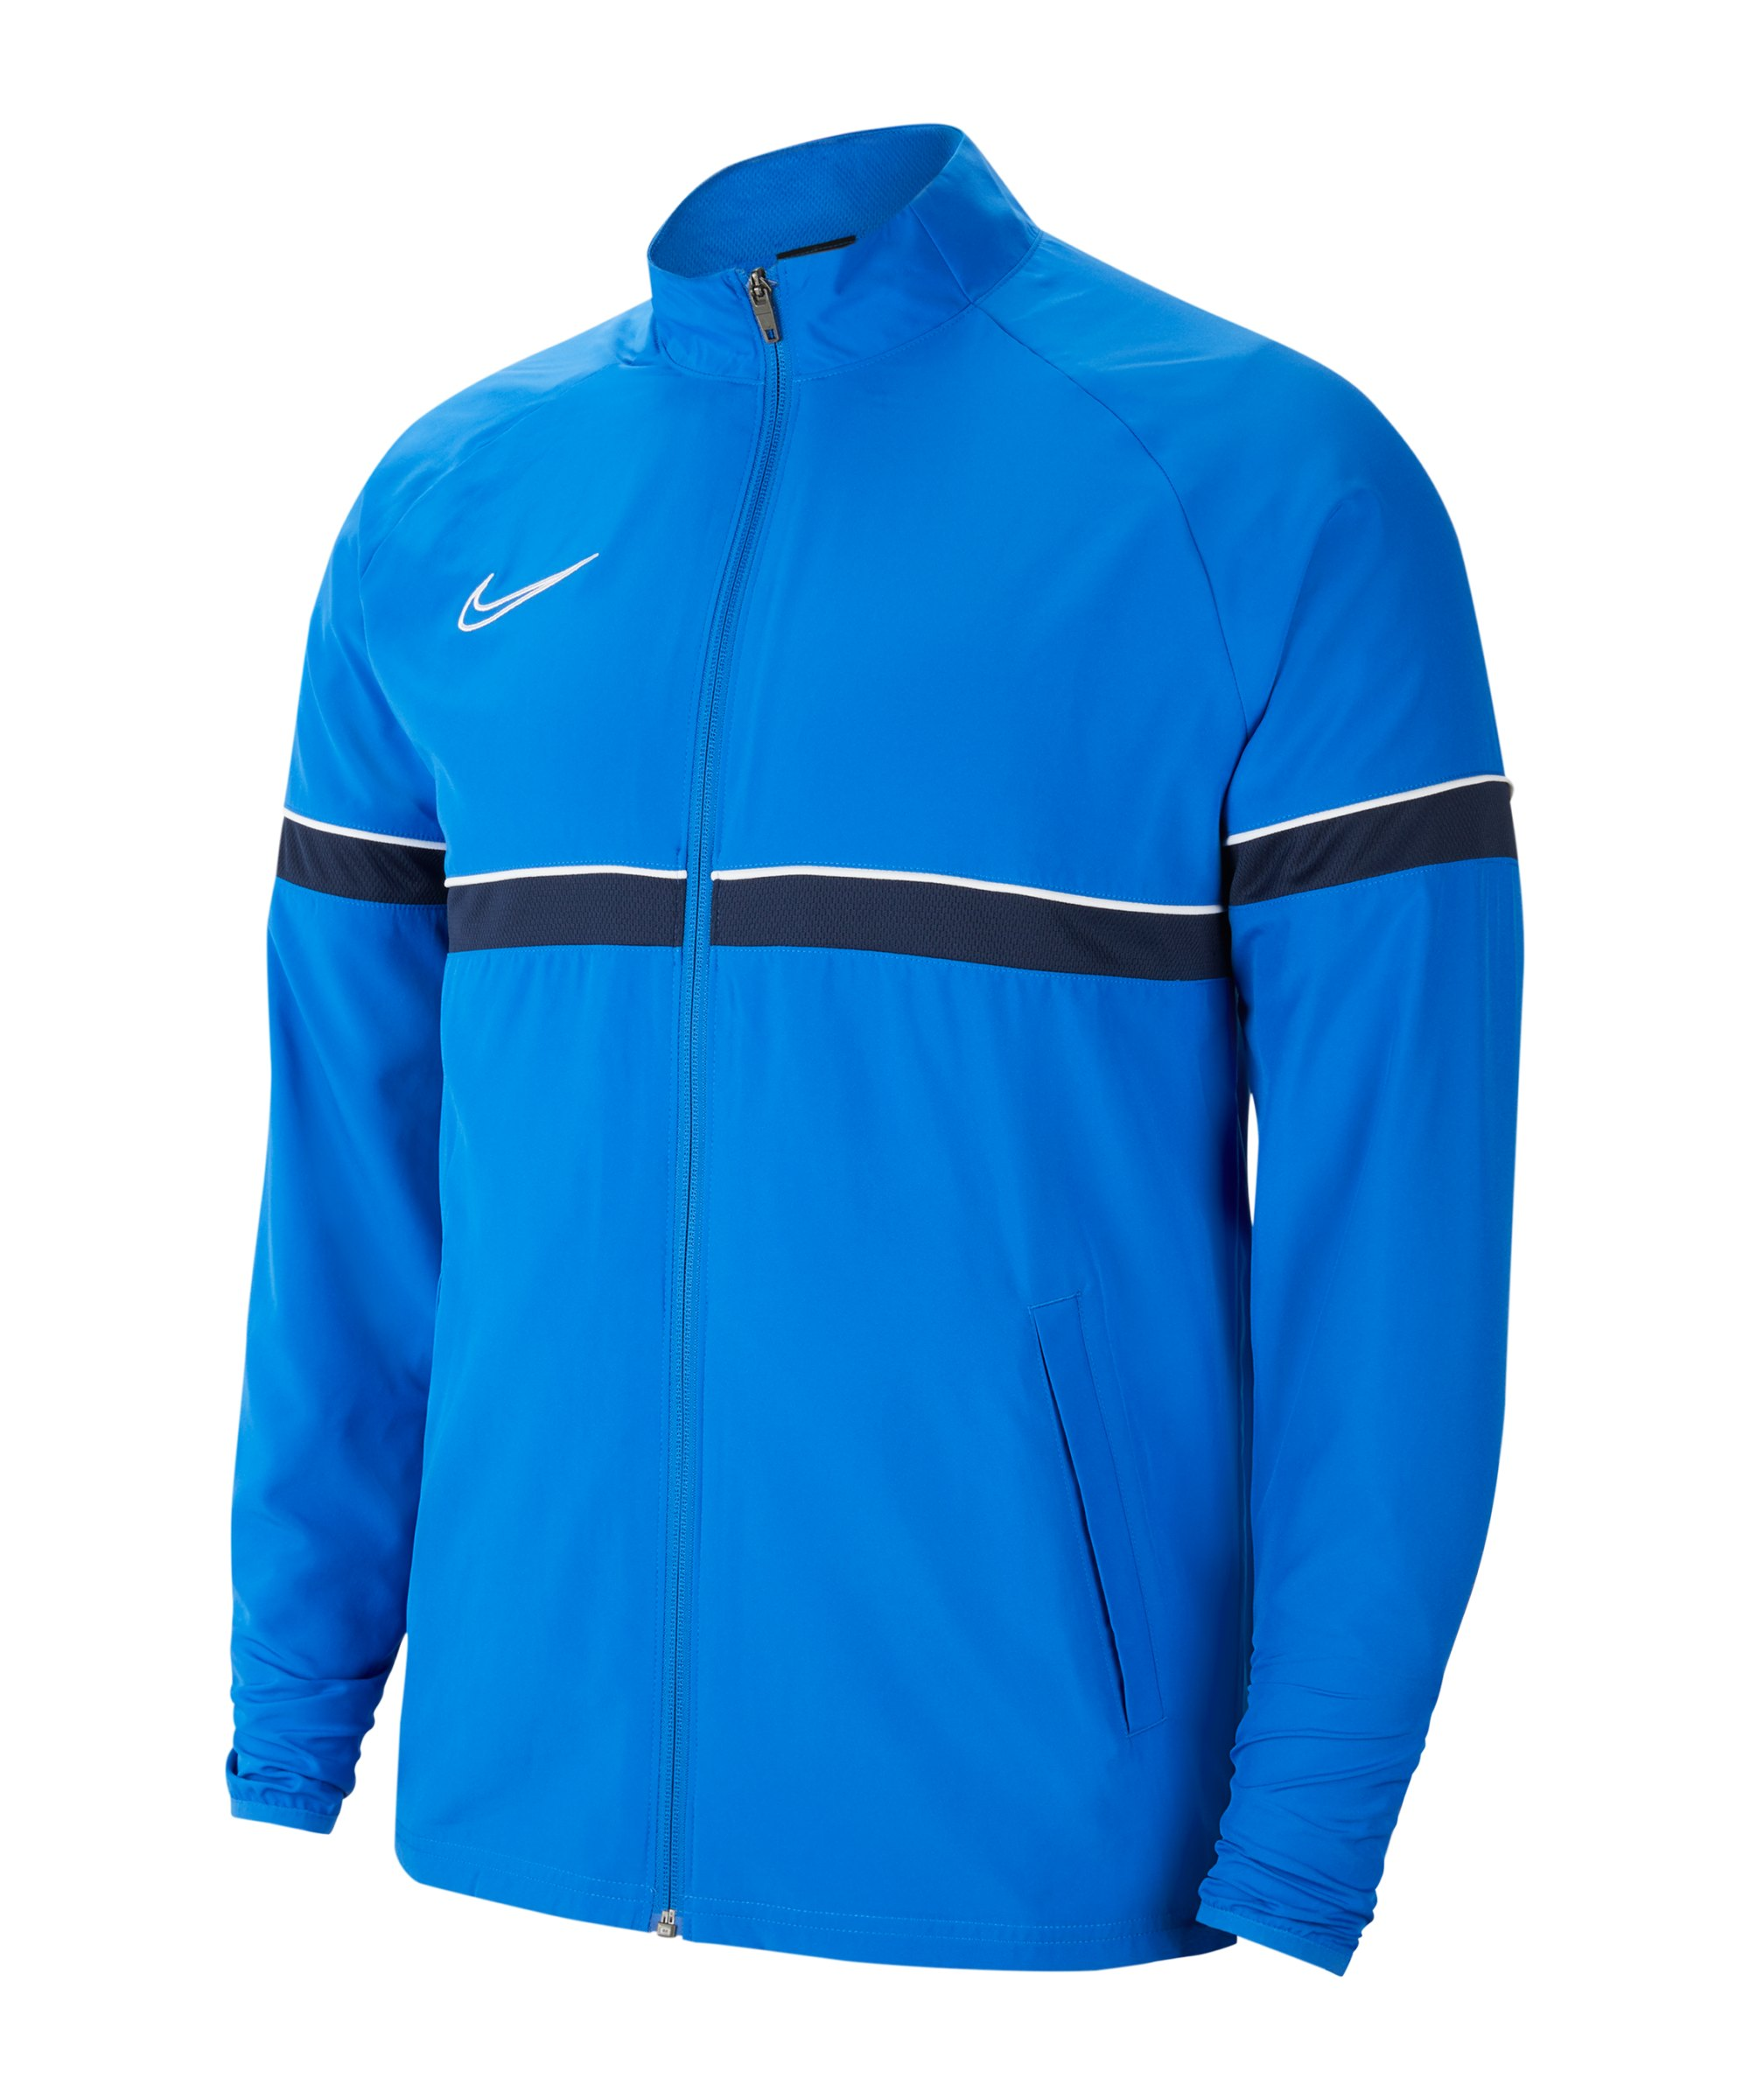 Nike Academy 21 Woven Trainingsjacke Blau F463 - blau